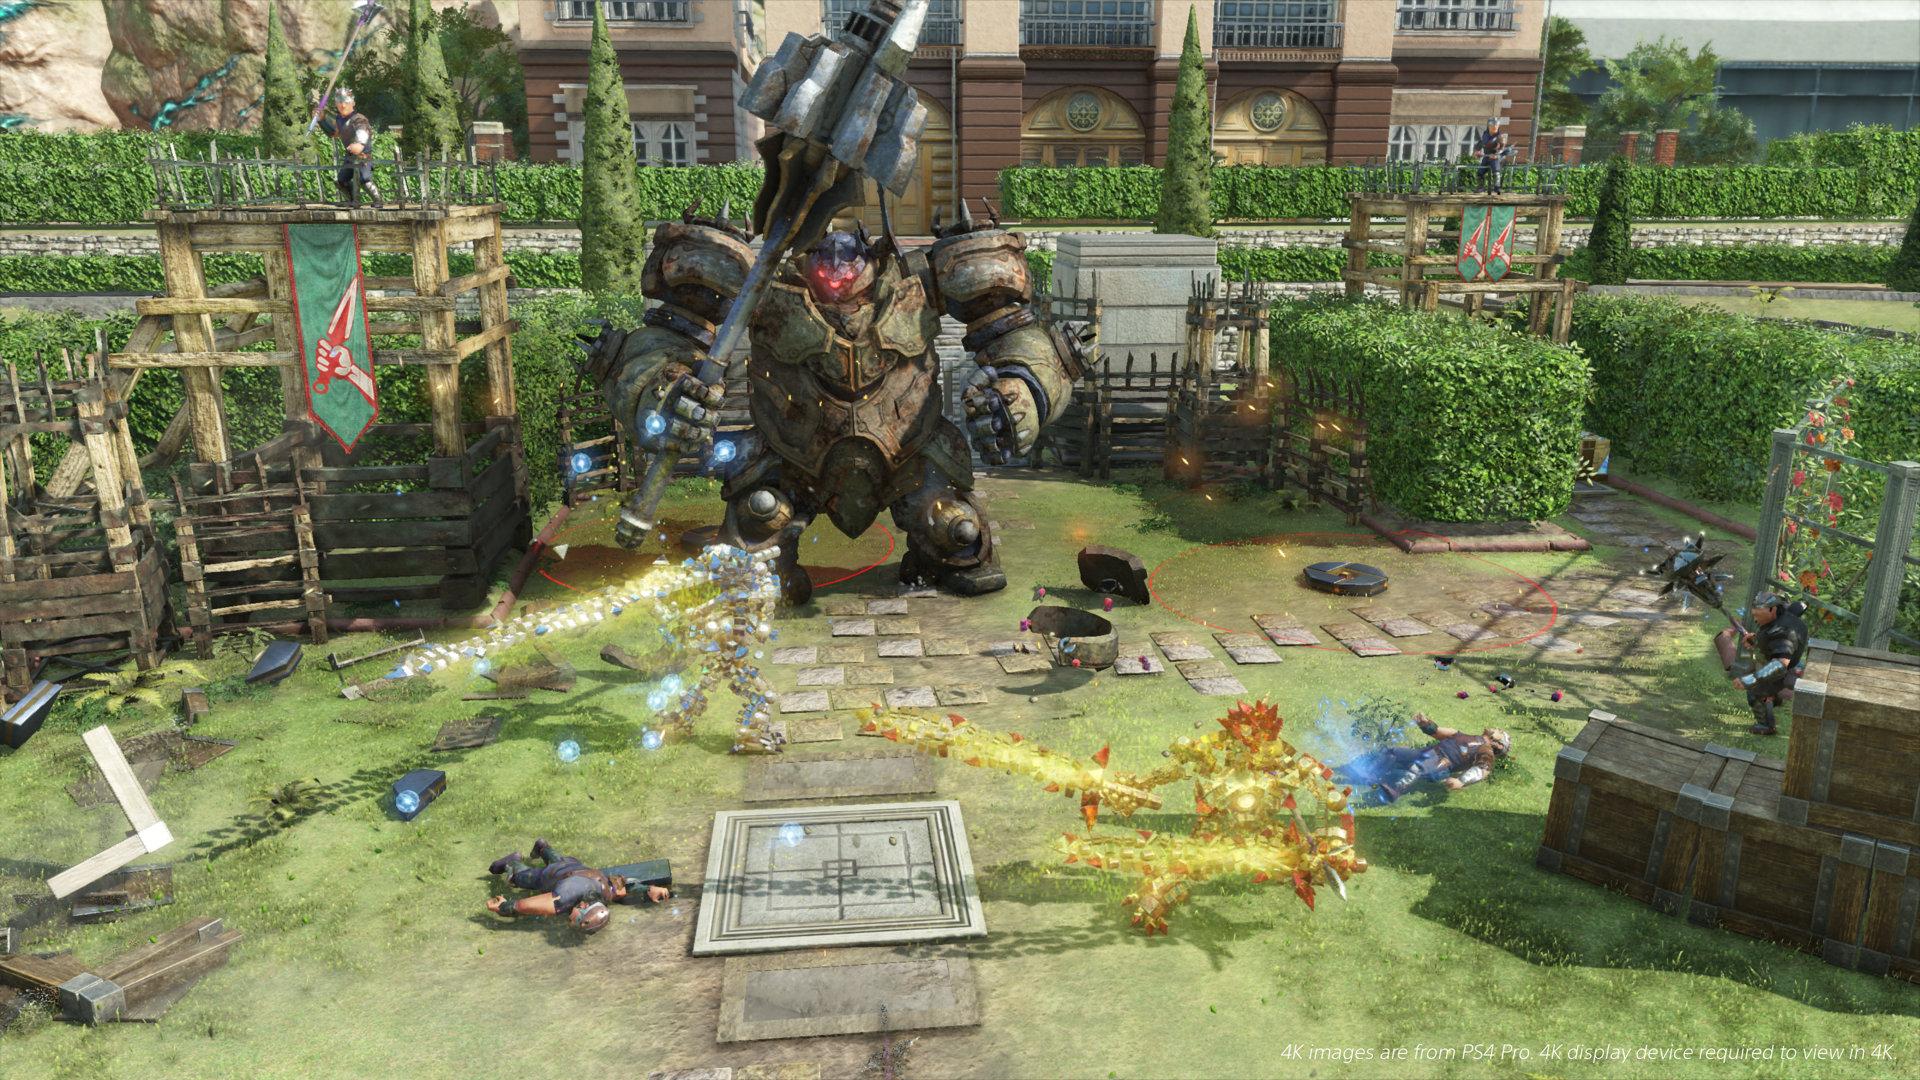 Knack 2 PlayStation 4 SCE Japan Studio